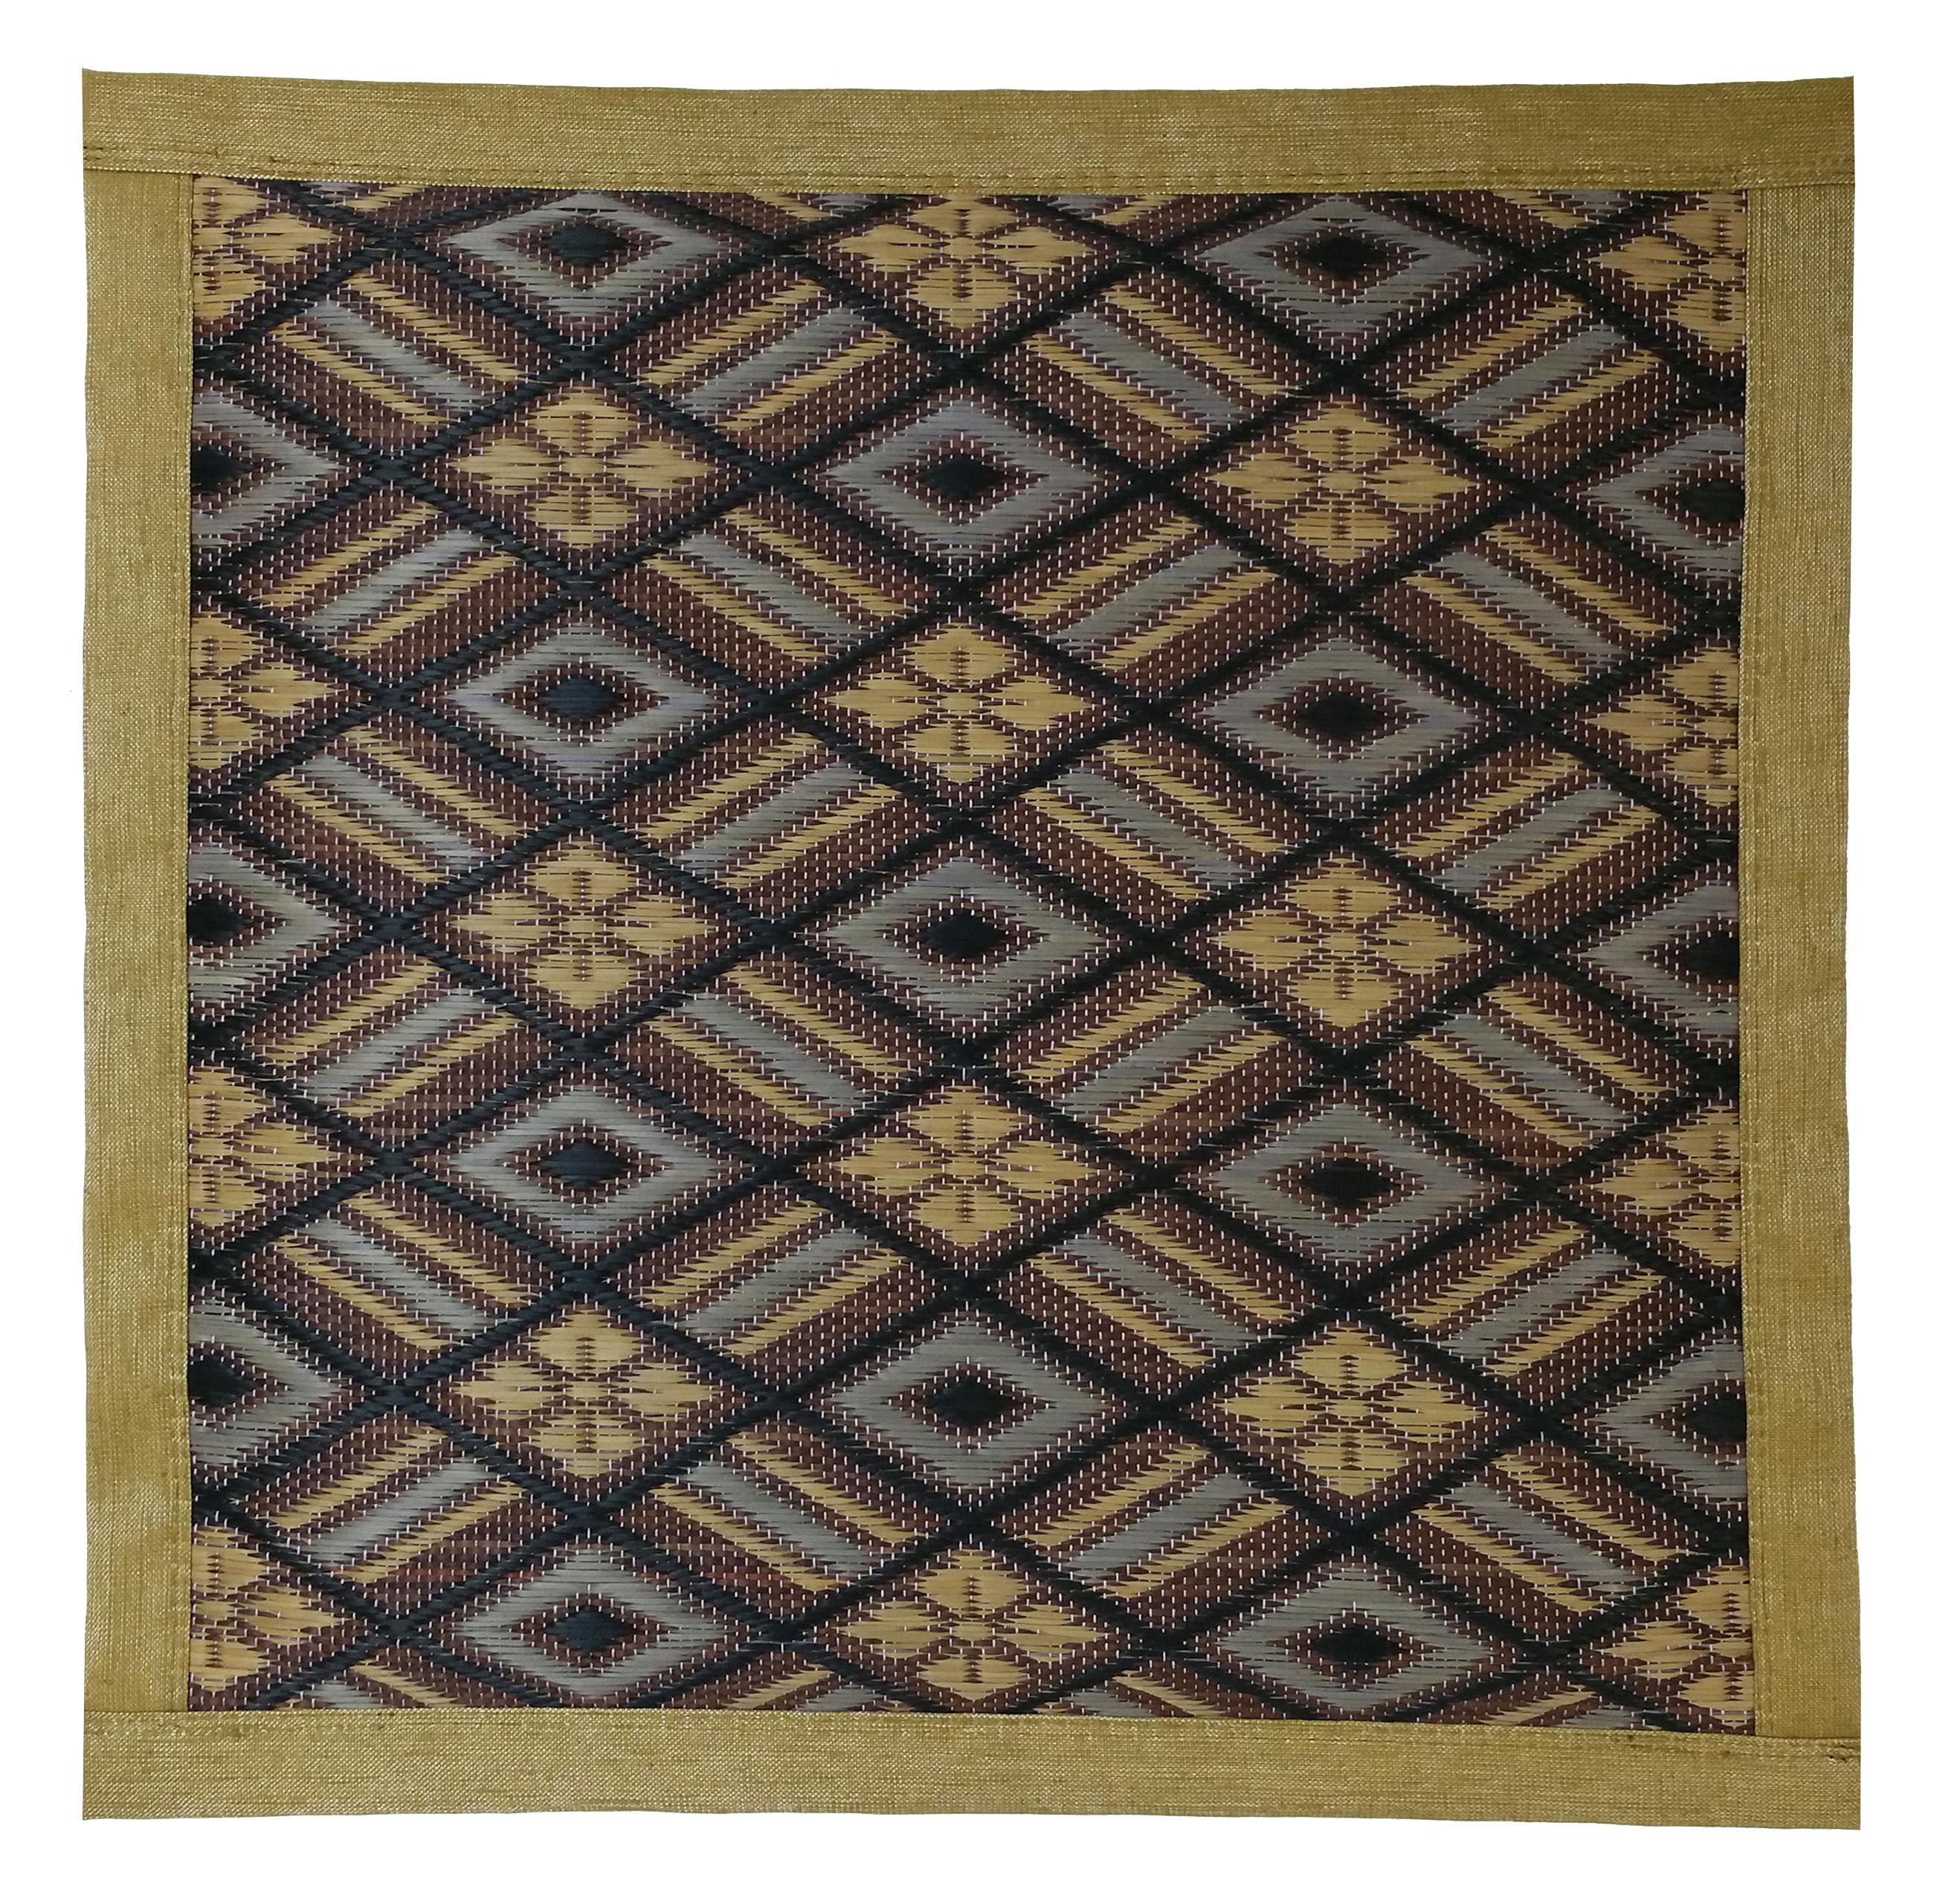 【純国産 い草座布団】四重織 45cmx45cmx3cm Japanese Rush Grass Cushion